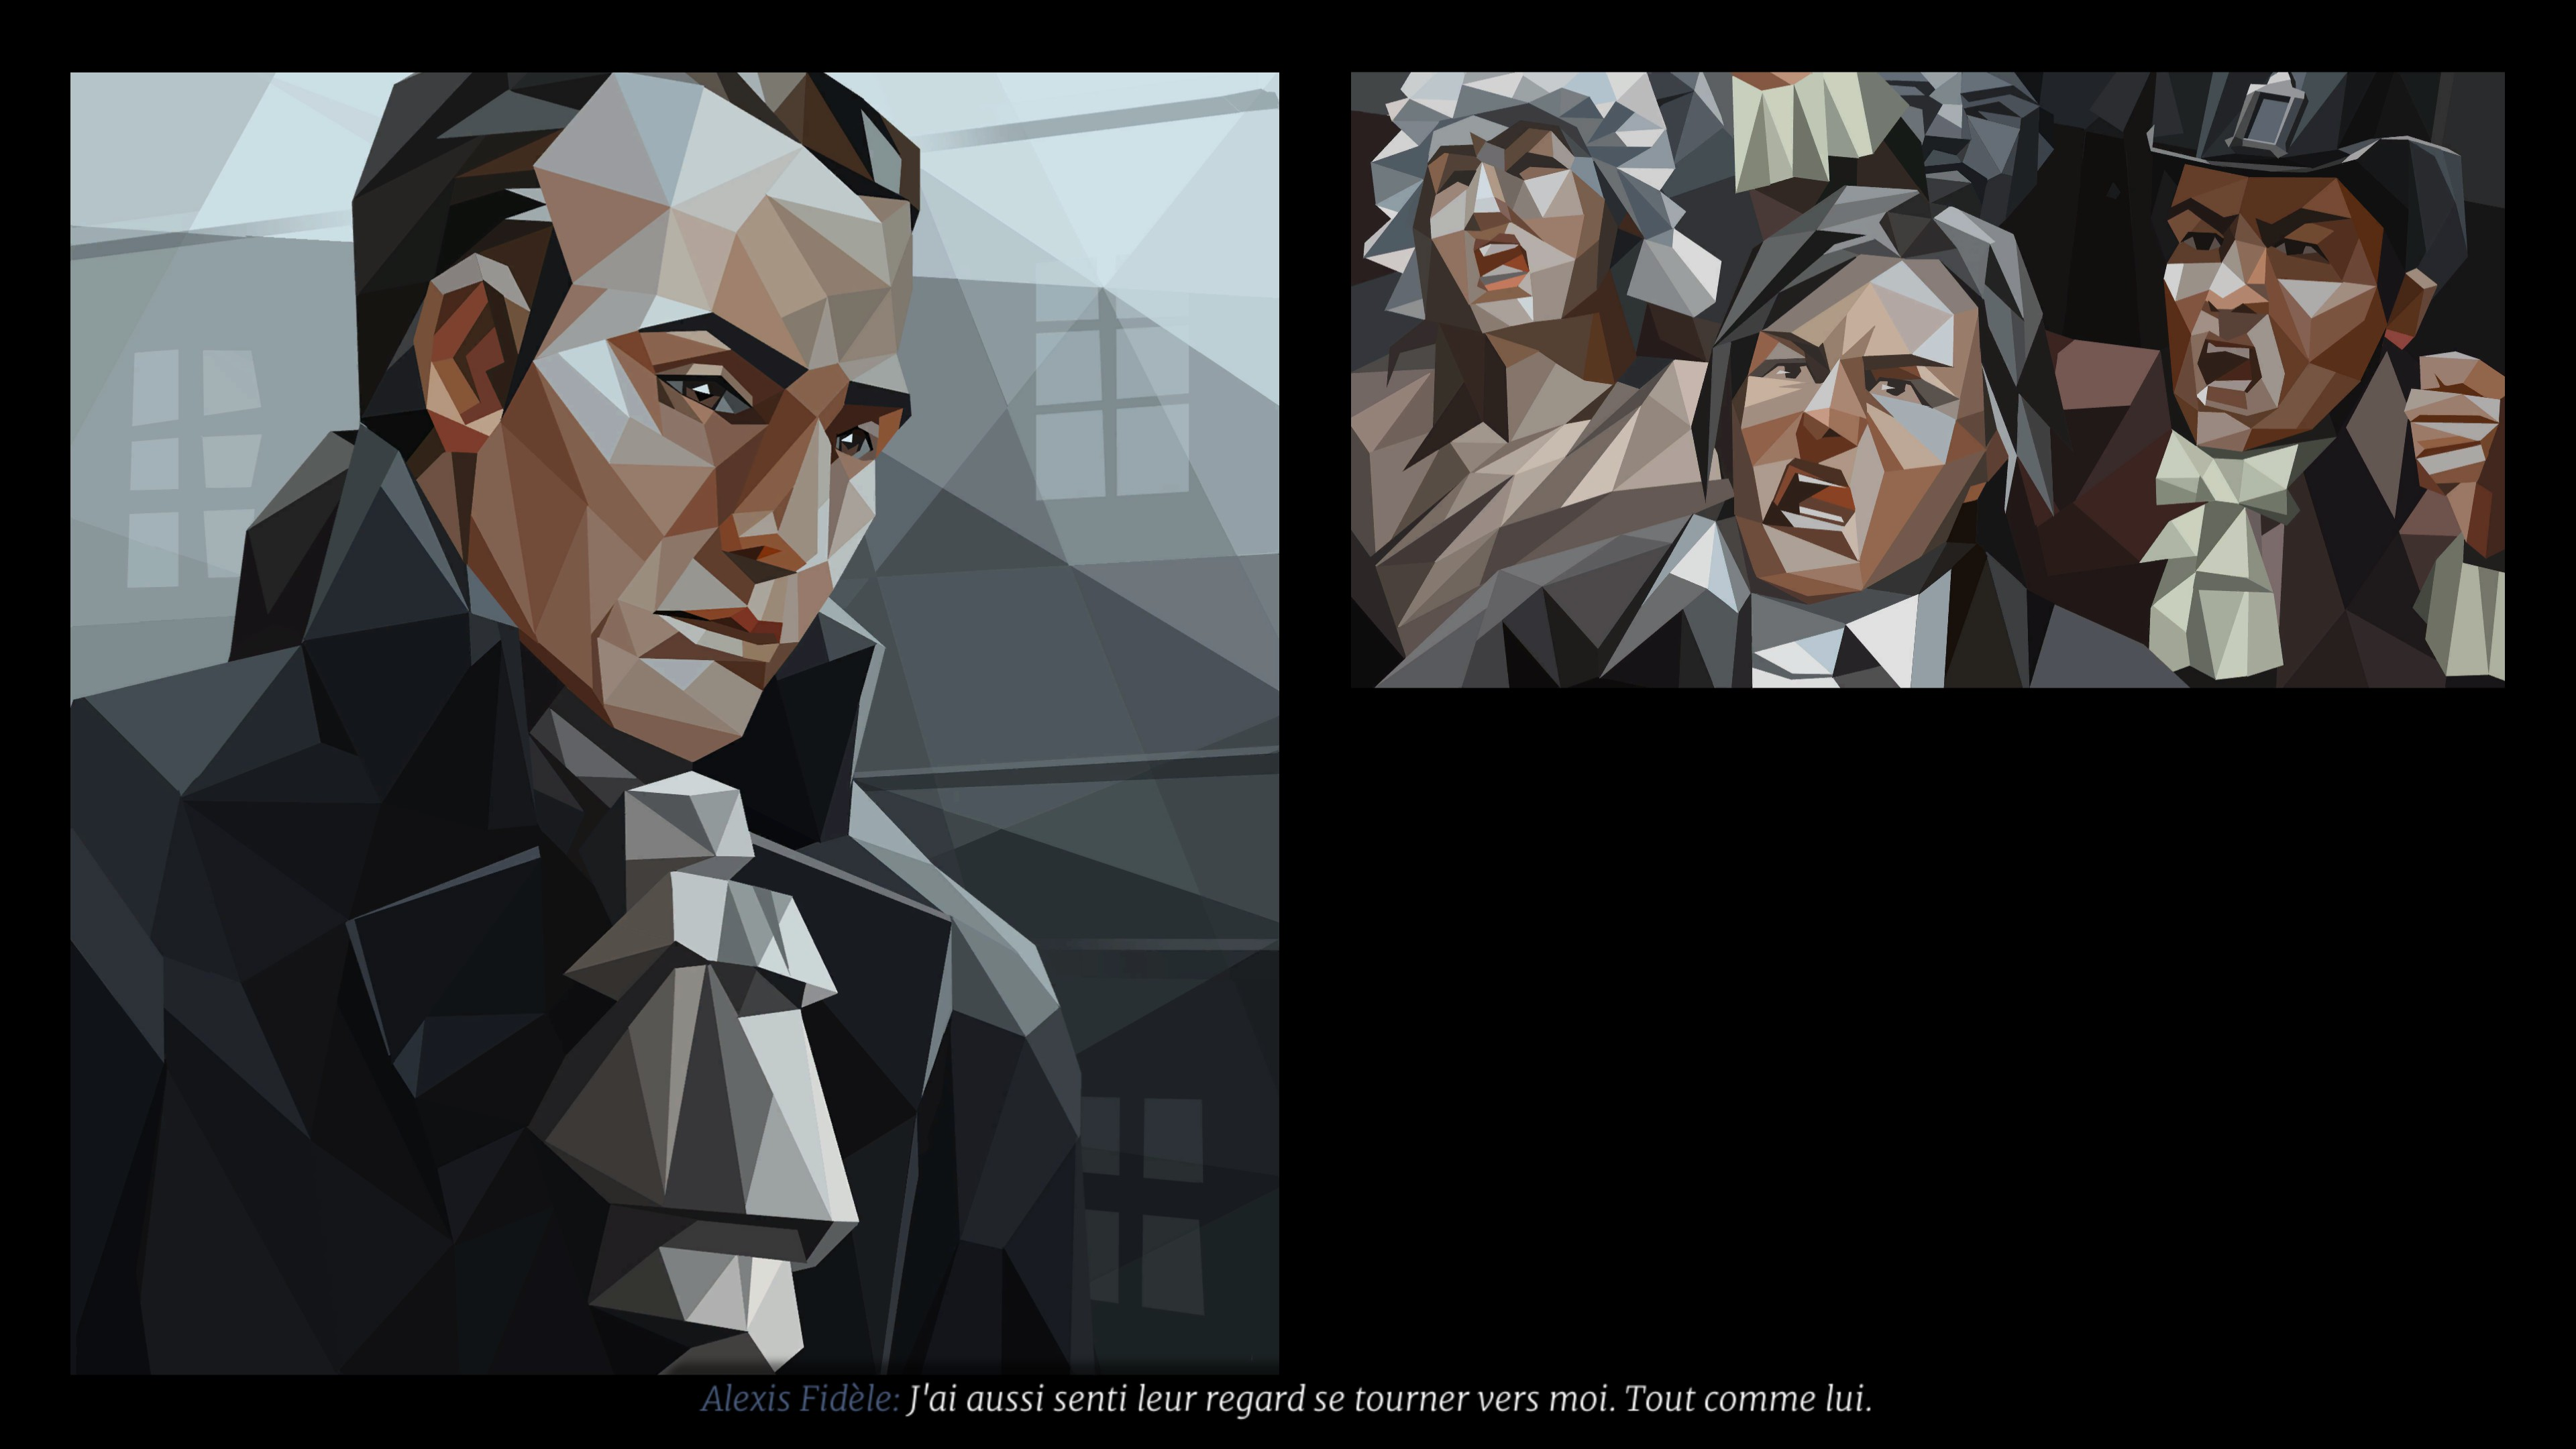 We-Revolution-Screen-gameblog-test -9-